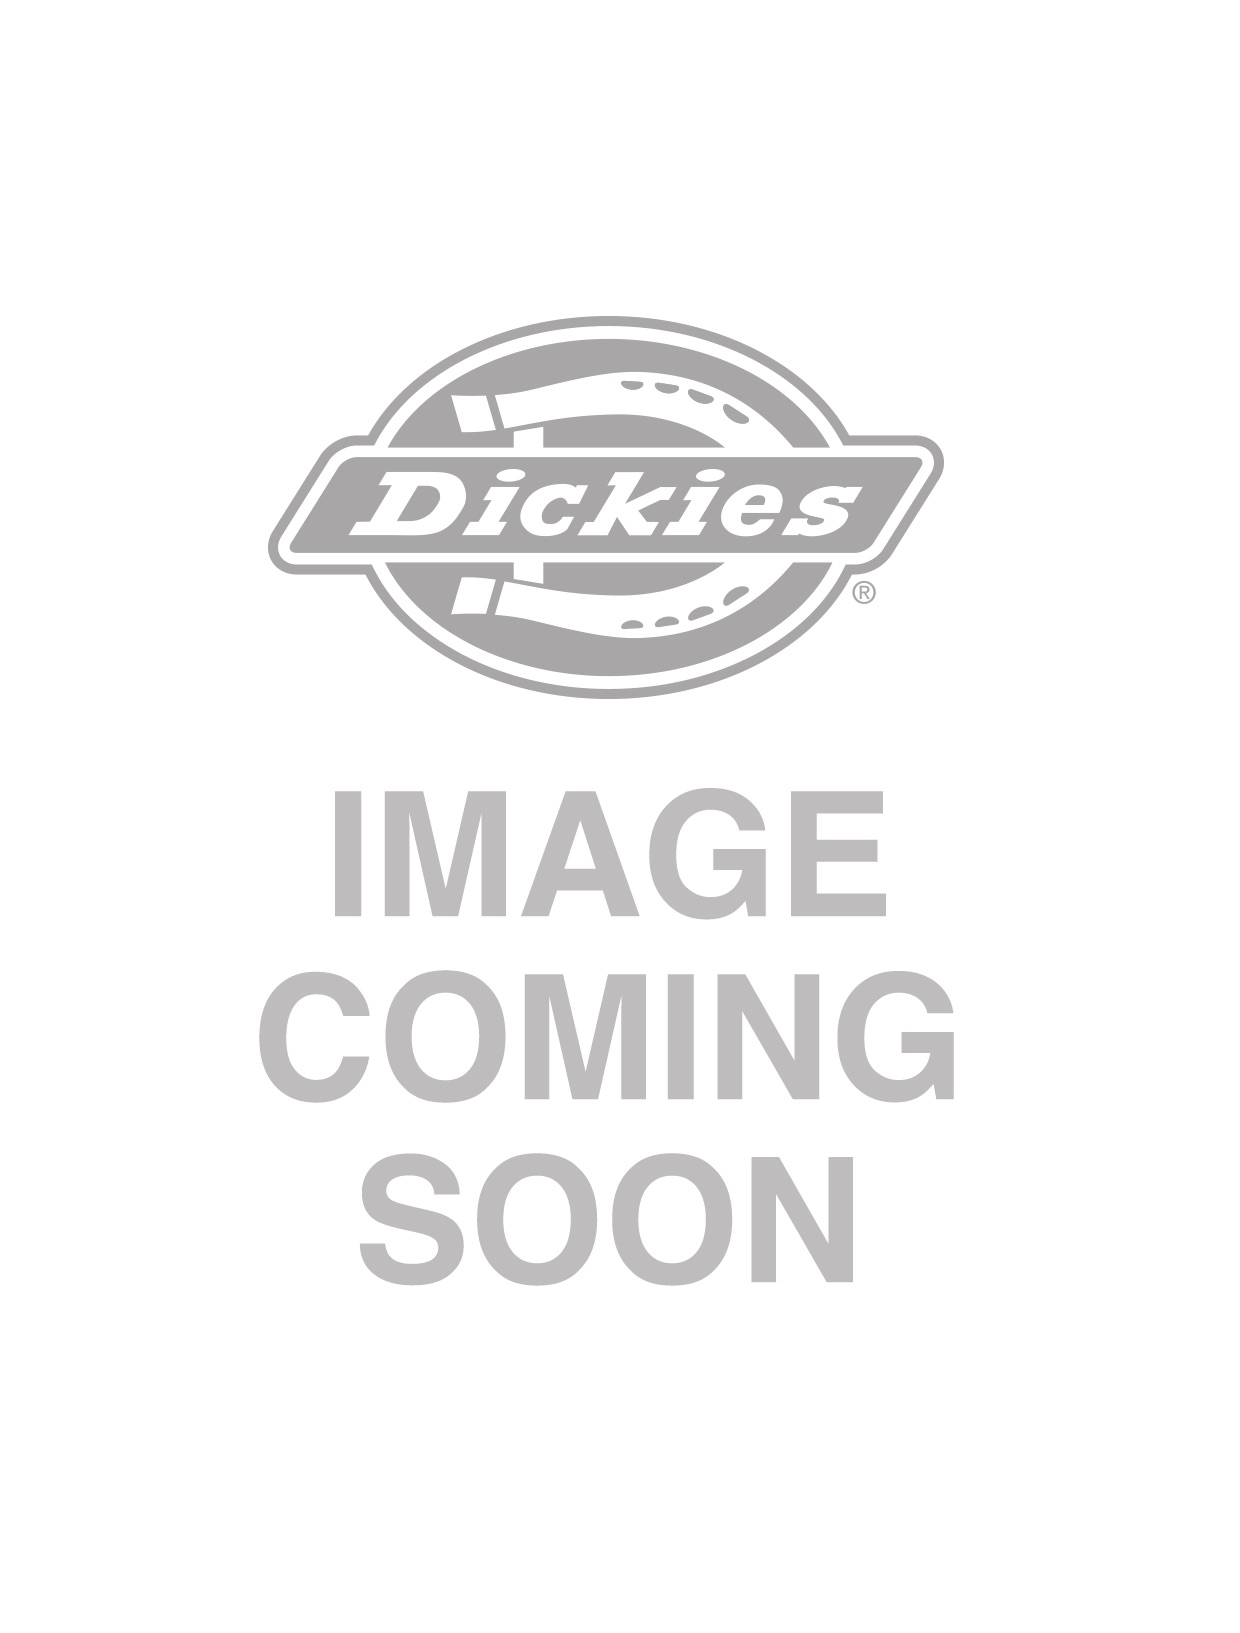 Dickies Eureka Springs Ripple Boot